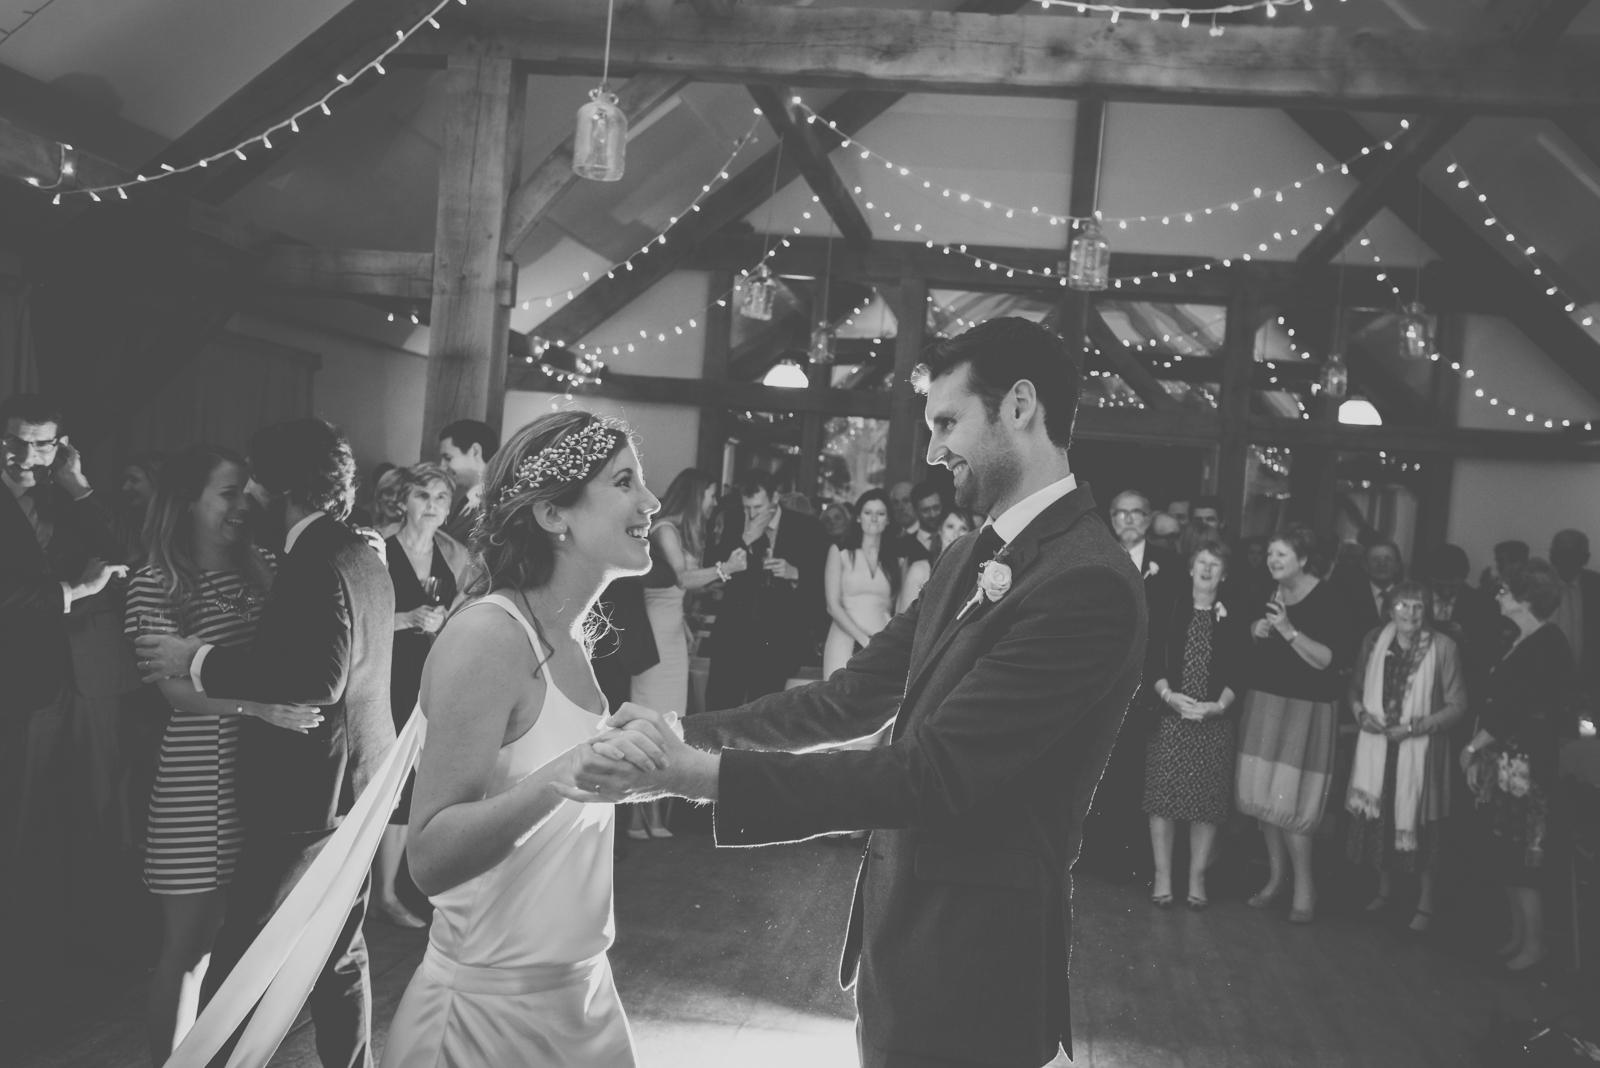 nancarrow-wedding-photography-162.jpg